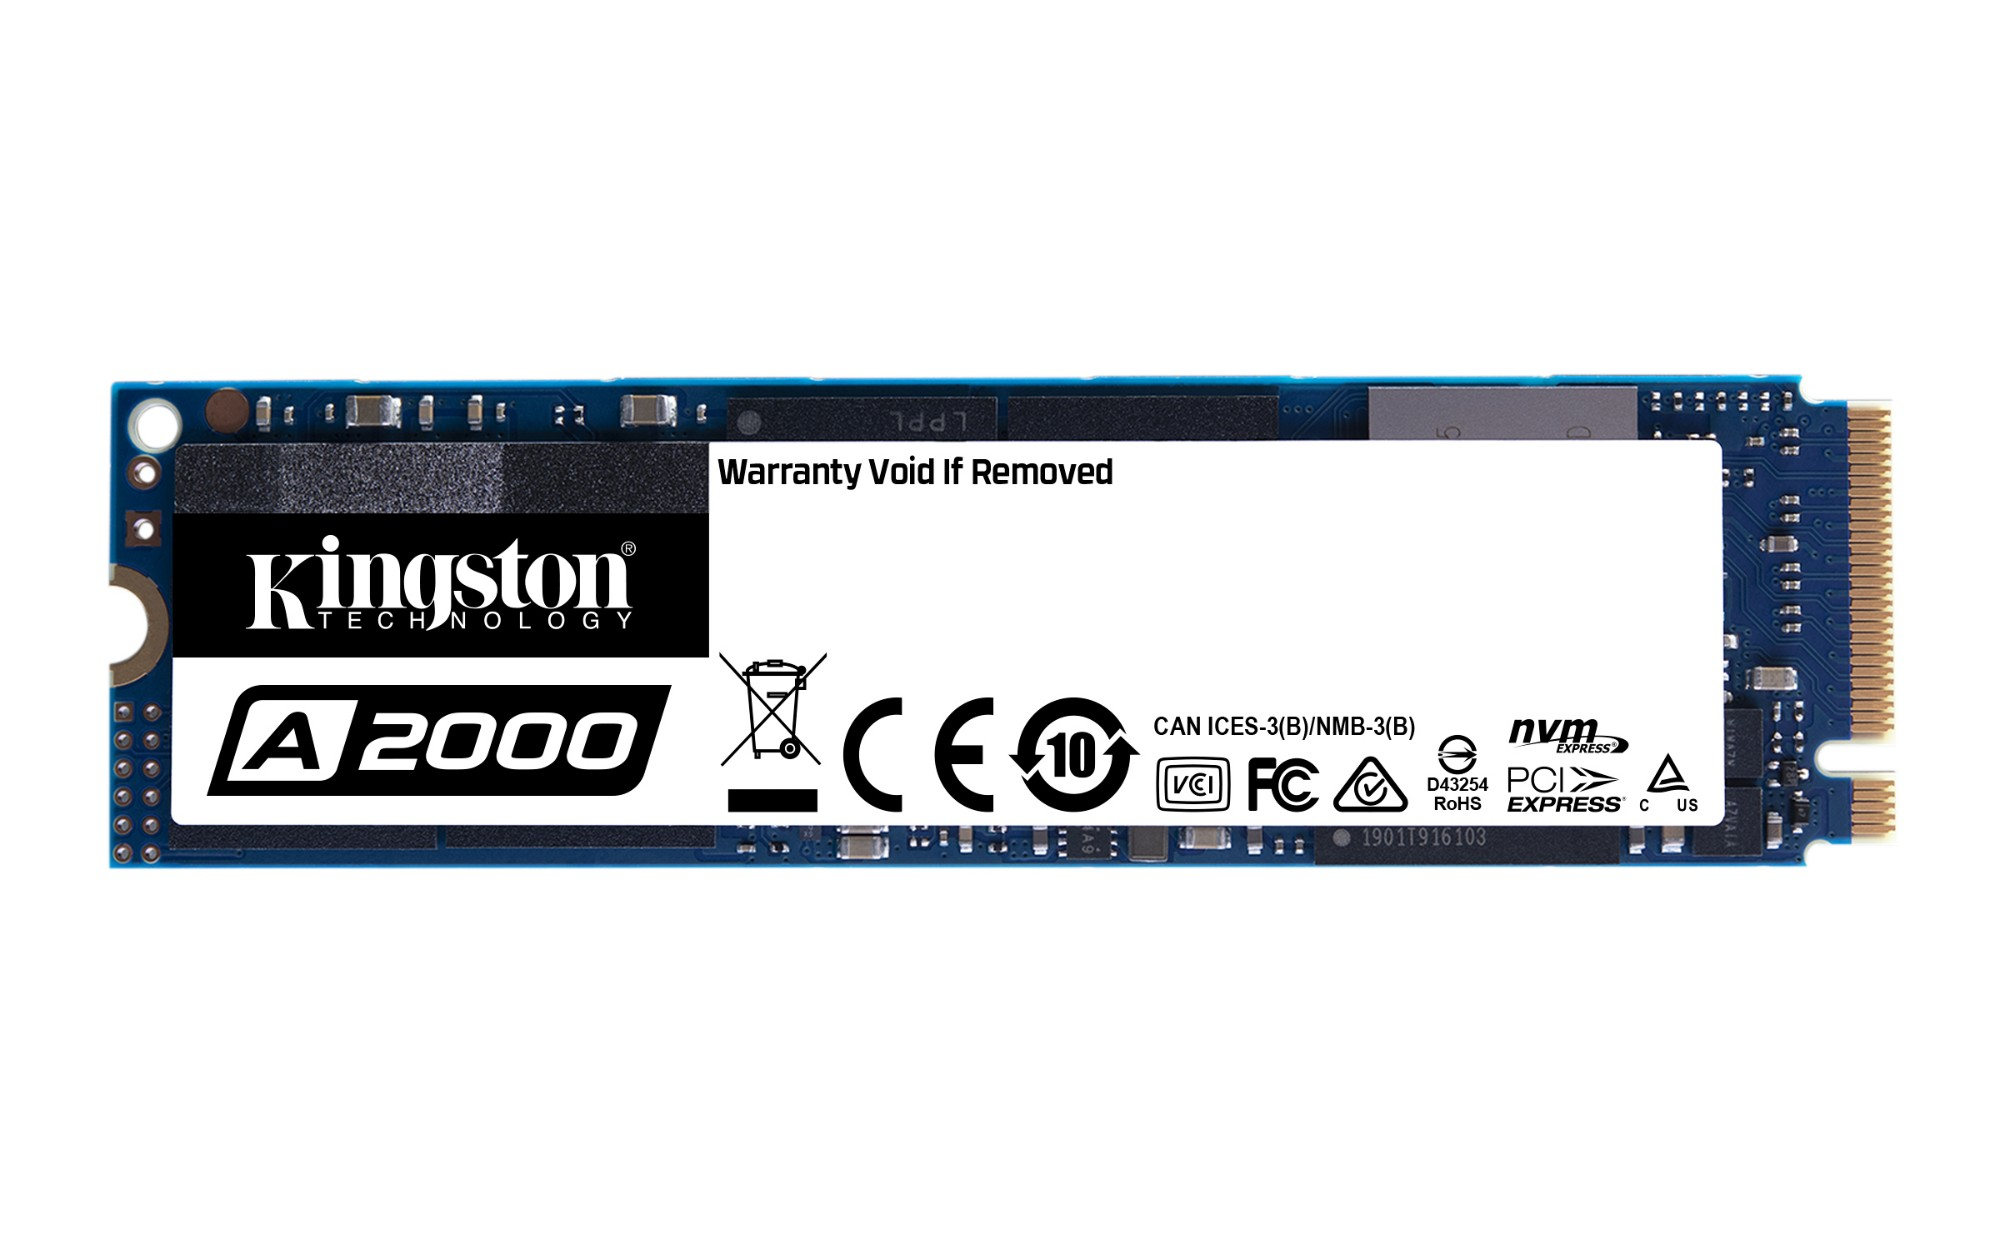 Kingston Technology A2000 internal solid state drive M.2 250 GB PCI Express 3.0 NVMe